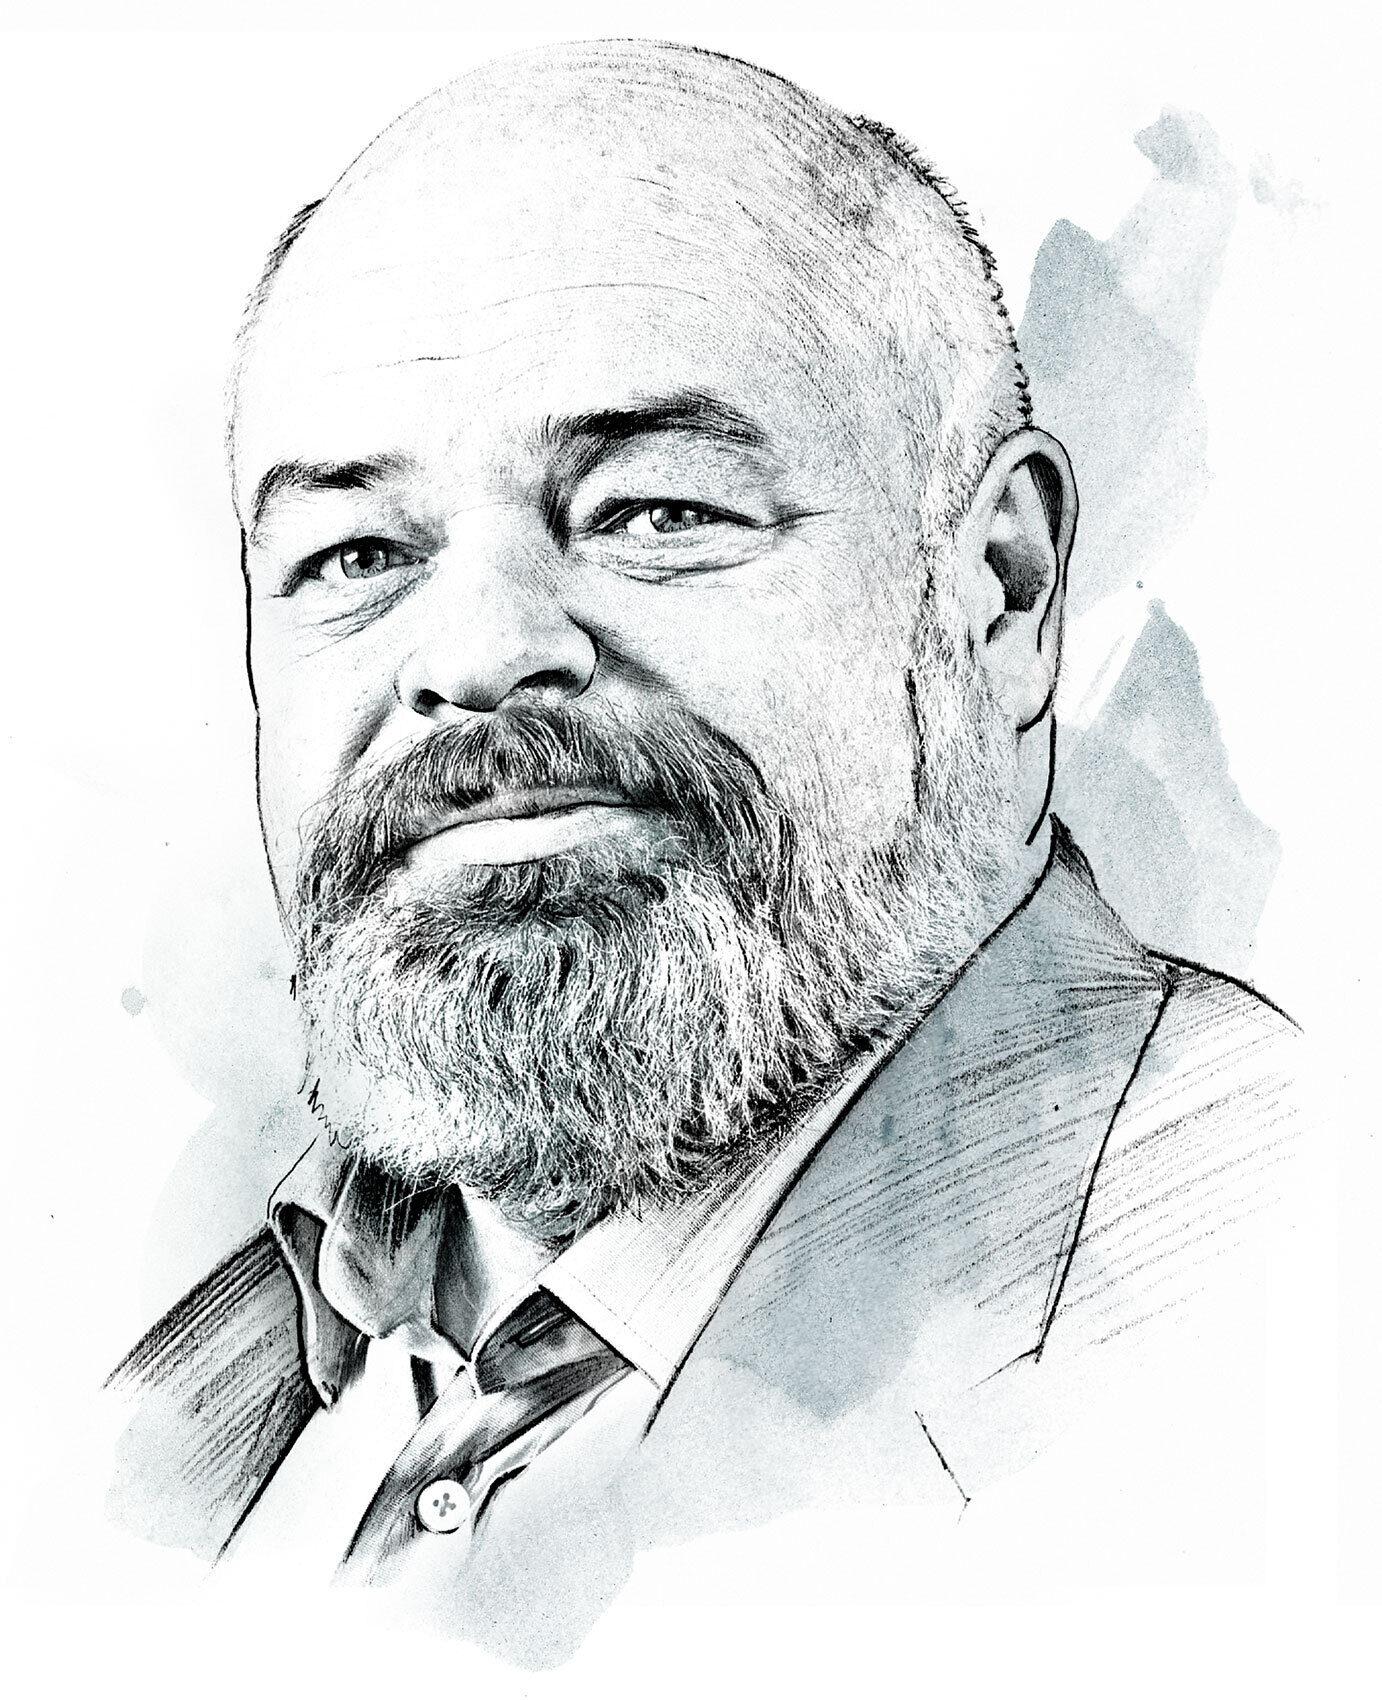 Dr Harry Telser portrait illustration - Kornel Illustration   Kornel Stadler portfolio